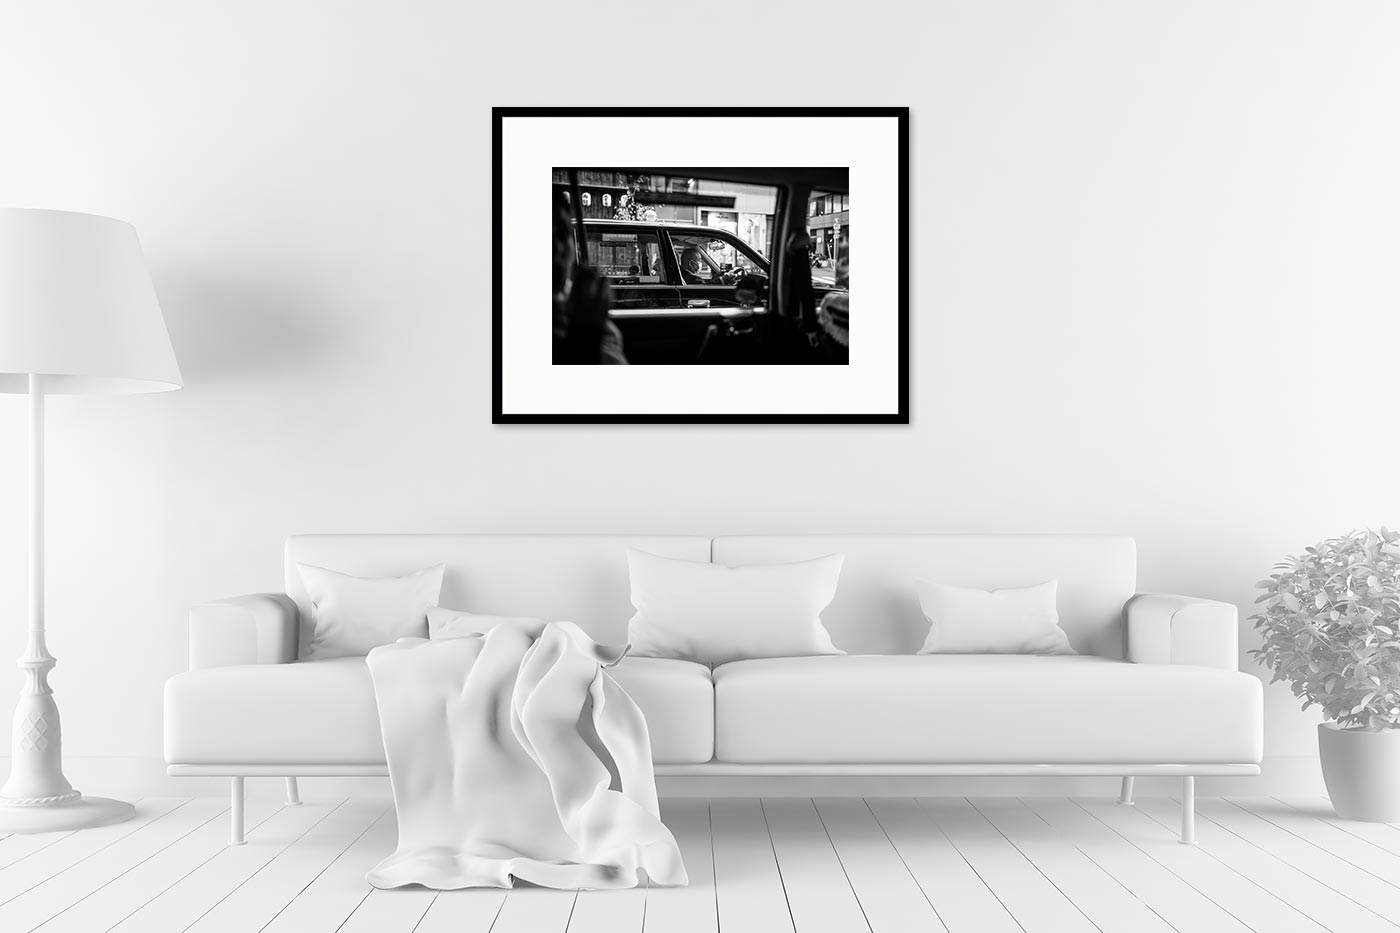 Cadre galerie 60x80 Taxi 3510